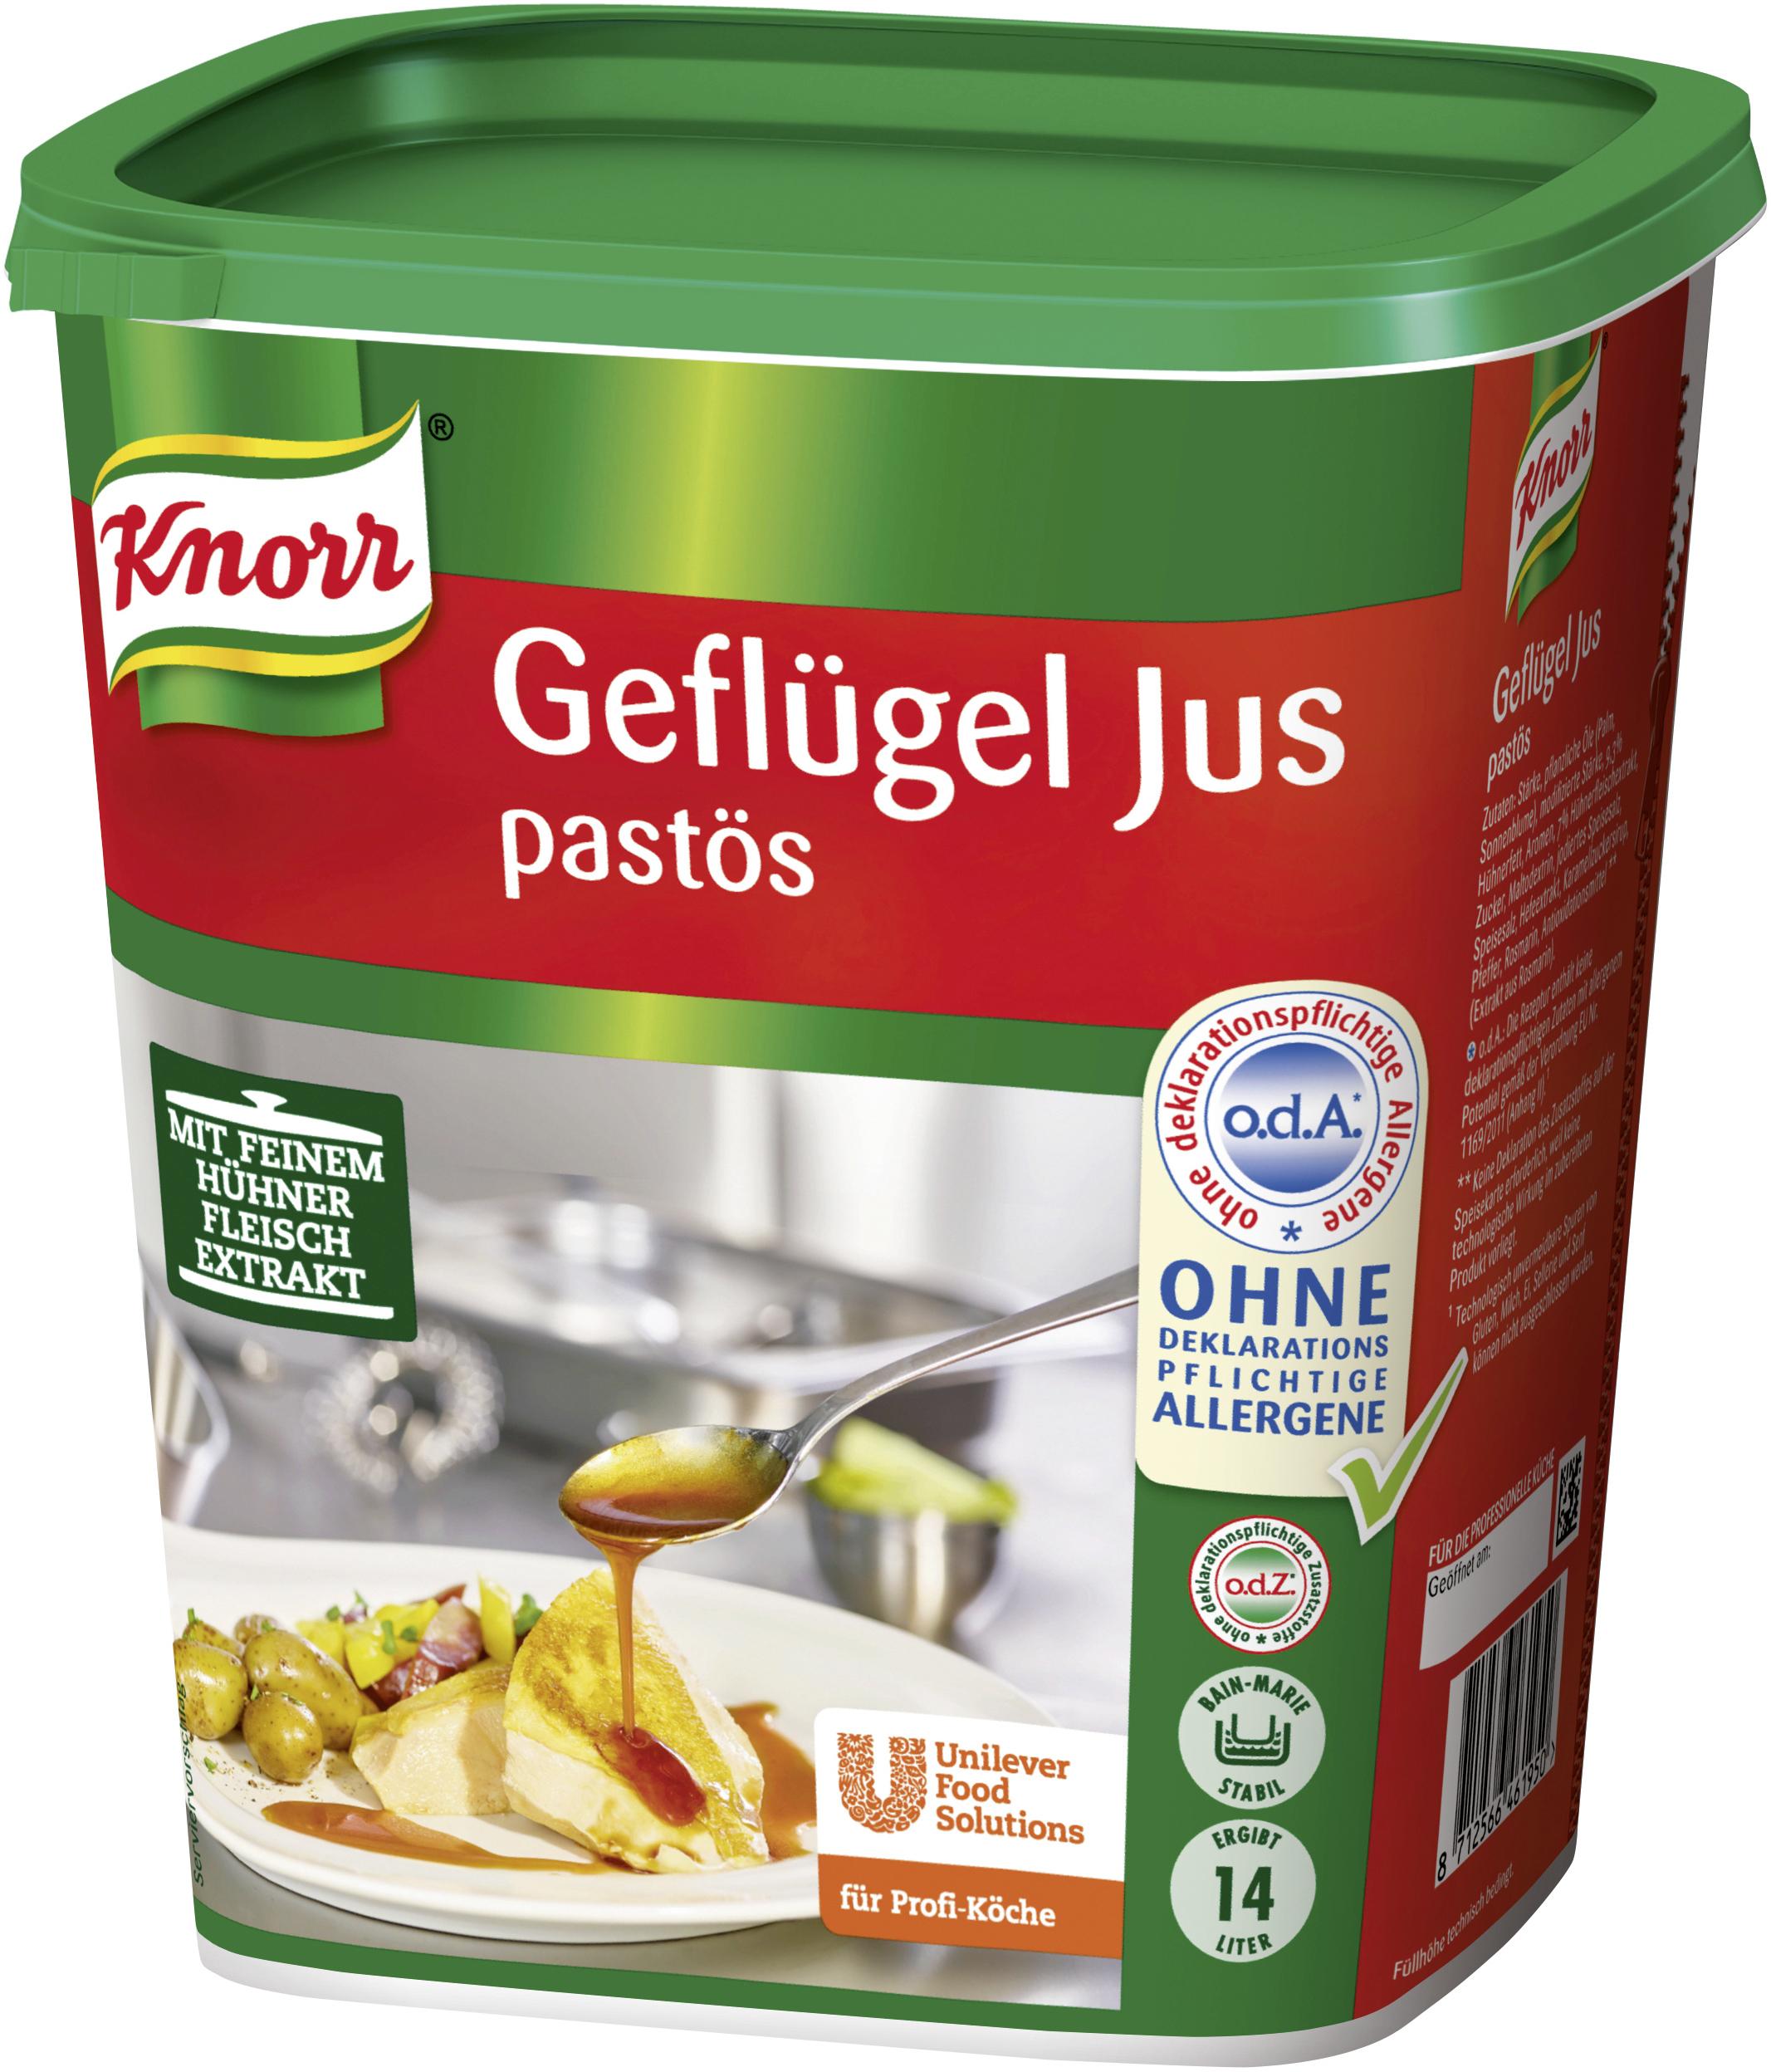 Knorr Geflügeljus pastös, 6 x 1,3 kg